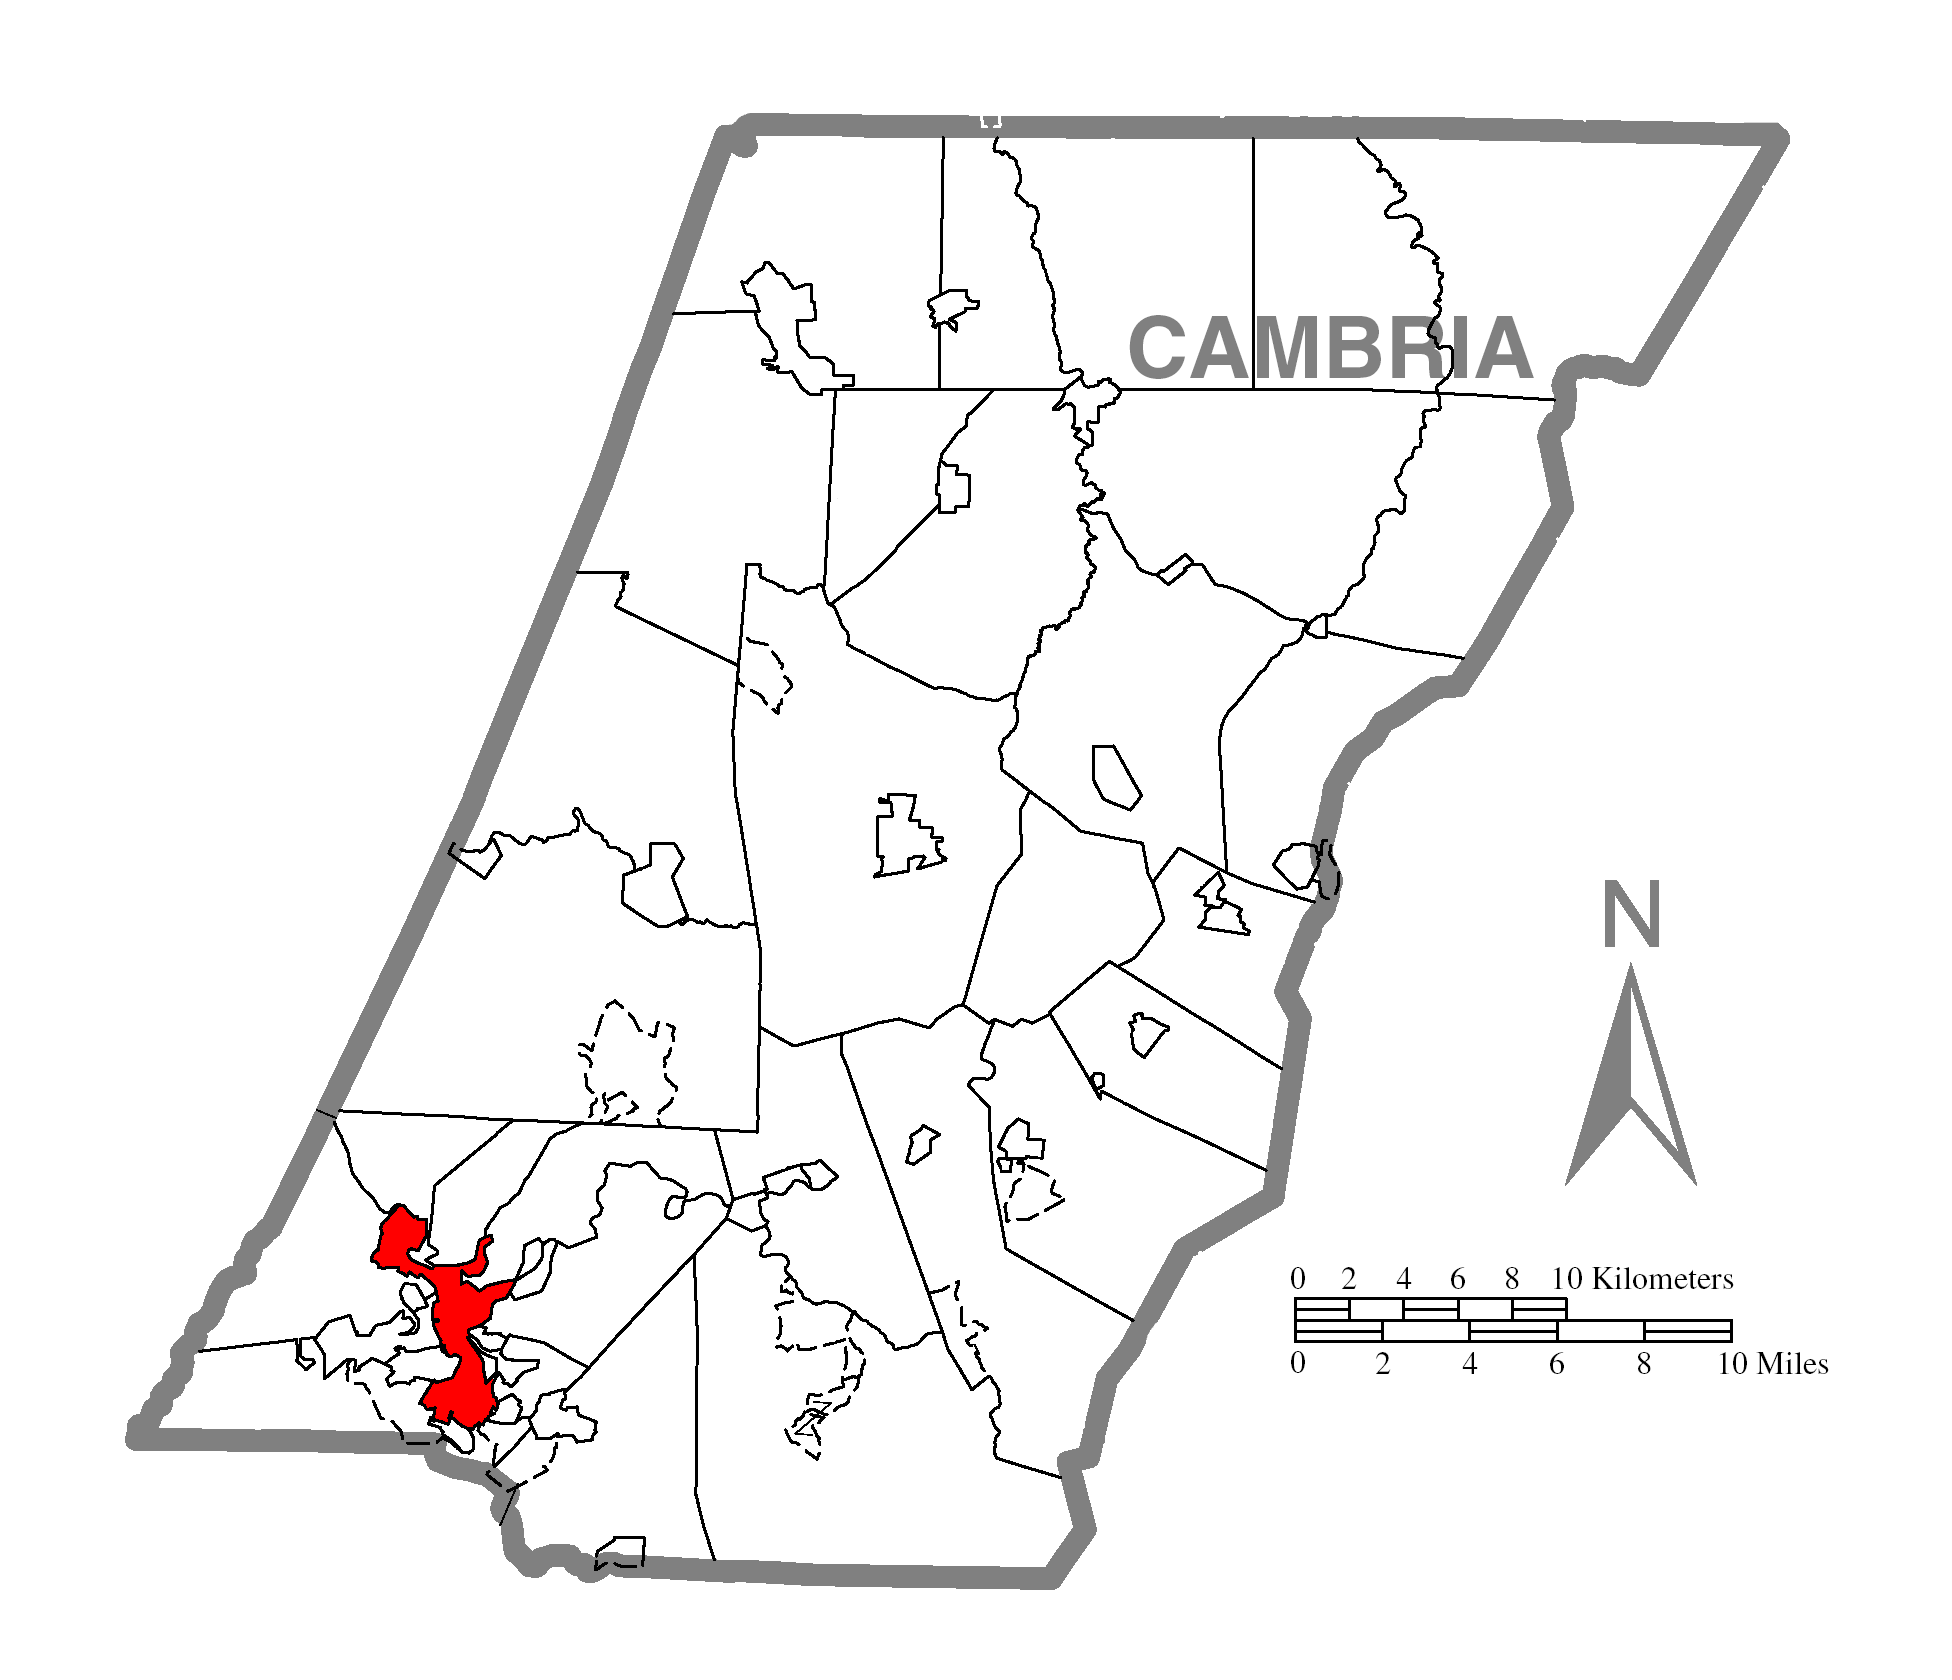 dating united states pennsylvania johnstown